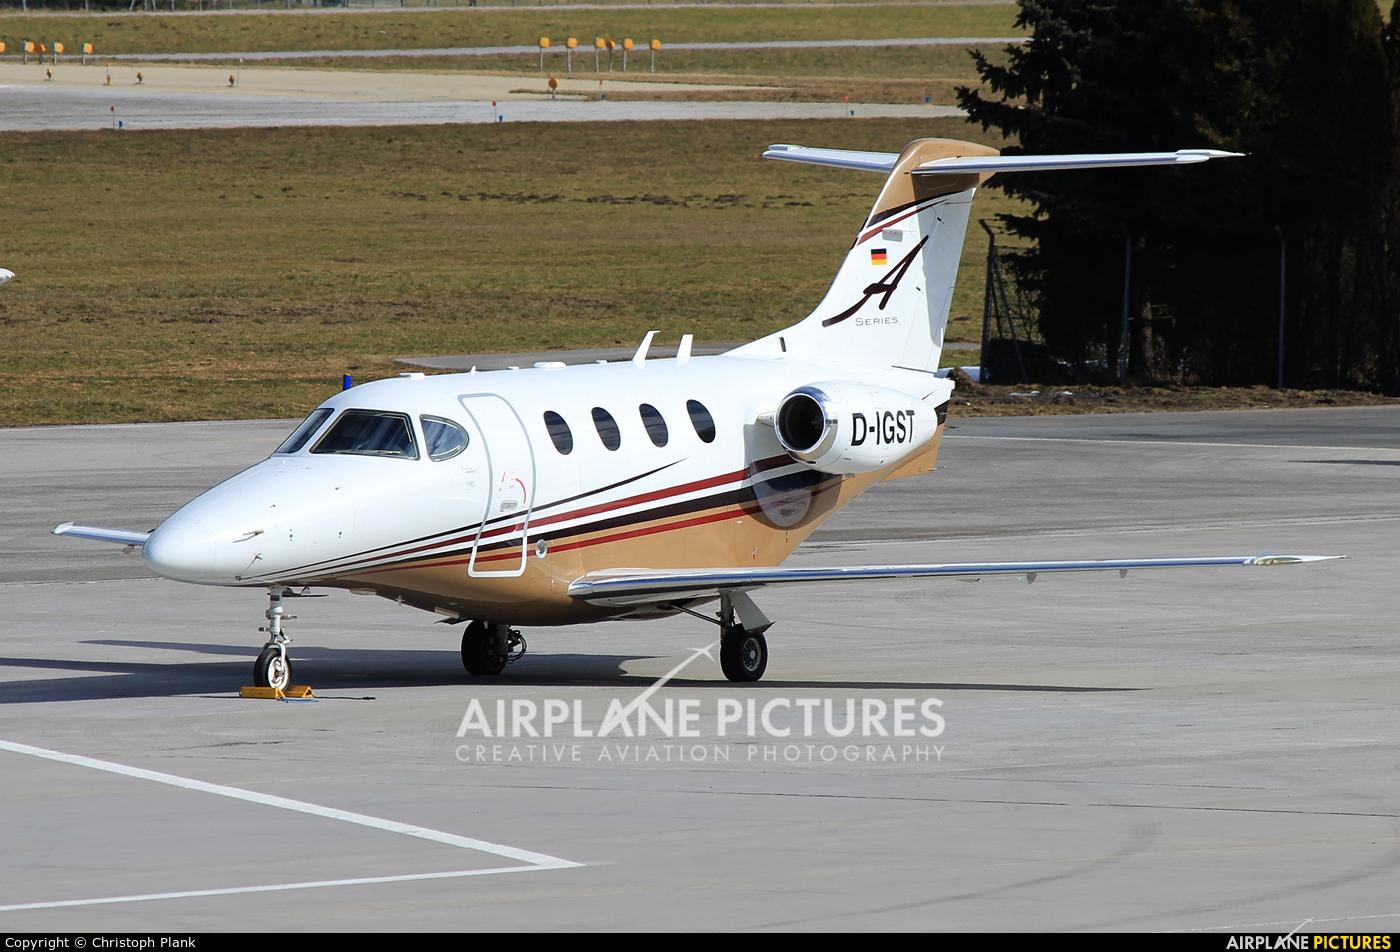 Private D-IGST aircraft at Innsbruck